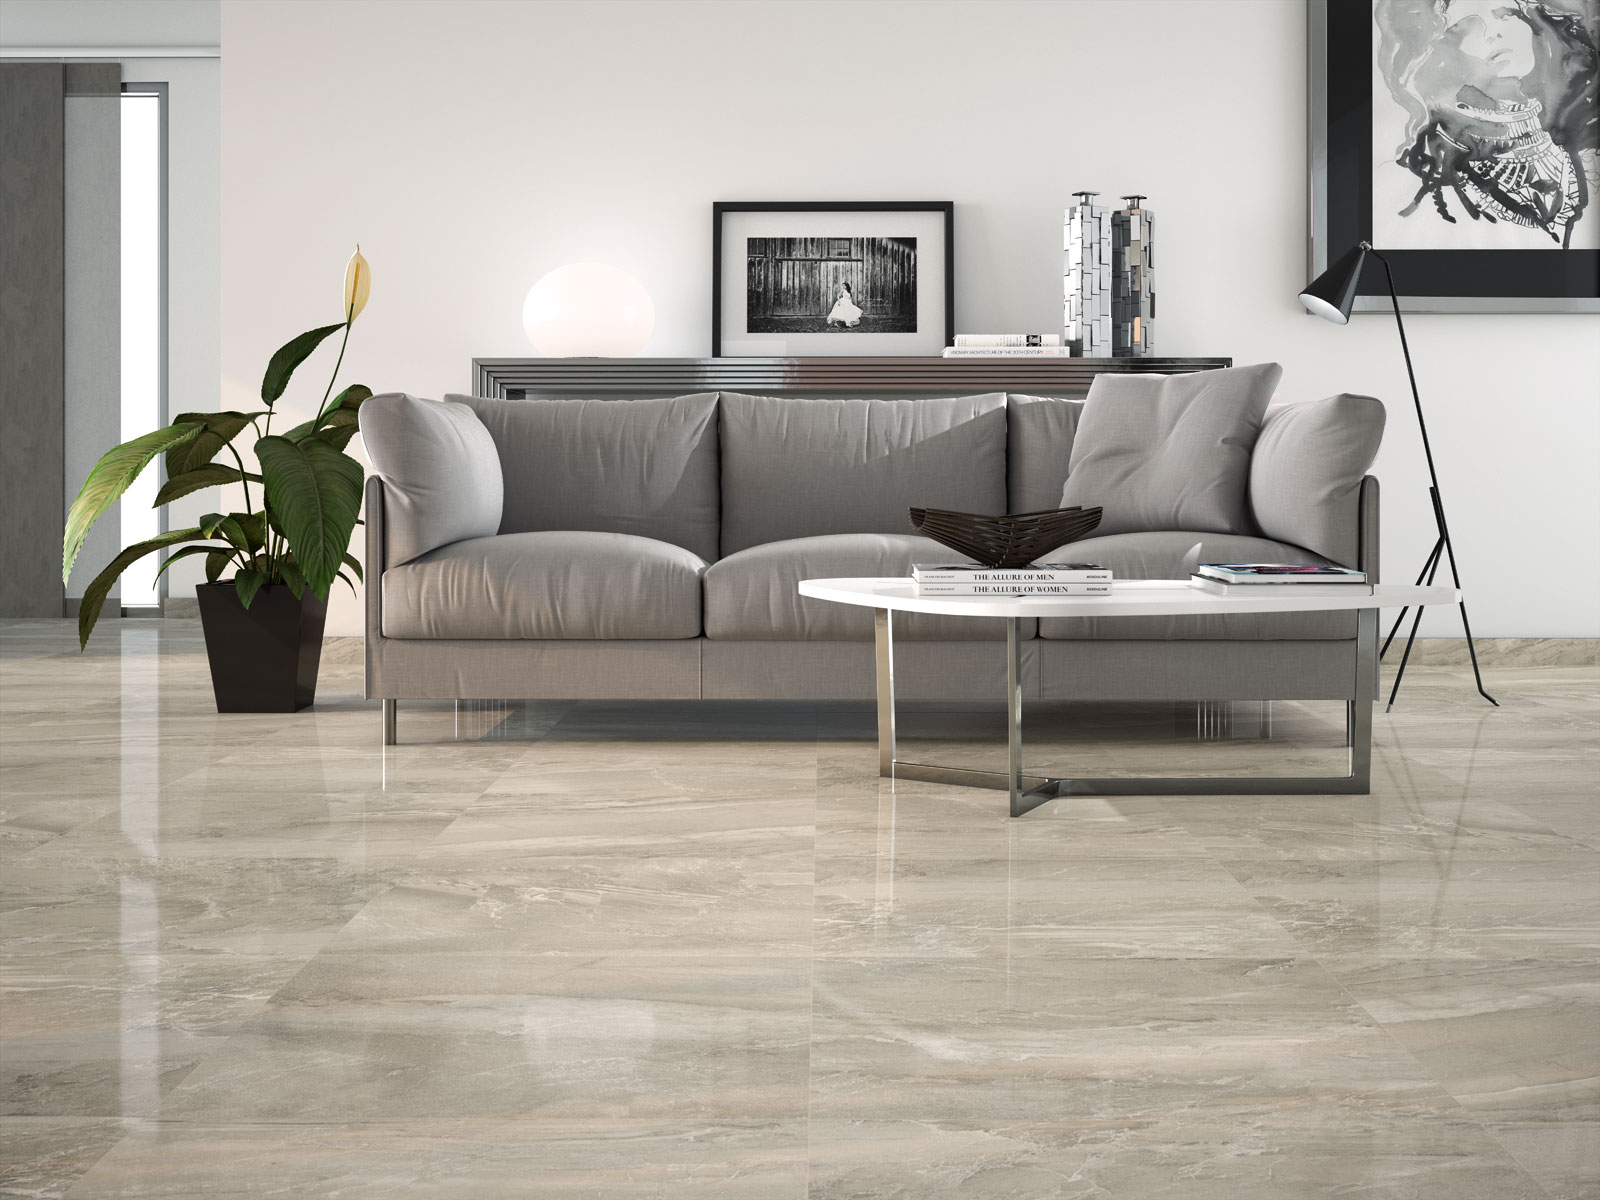 Lithos gres effetto marmo marazzi - Piastrelle gres porcellanato effetto marmo ...